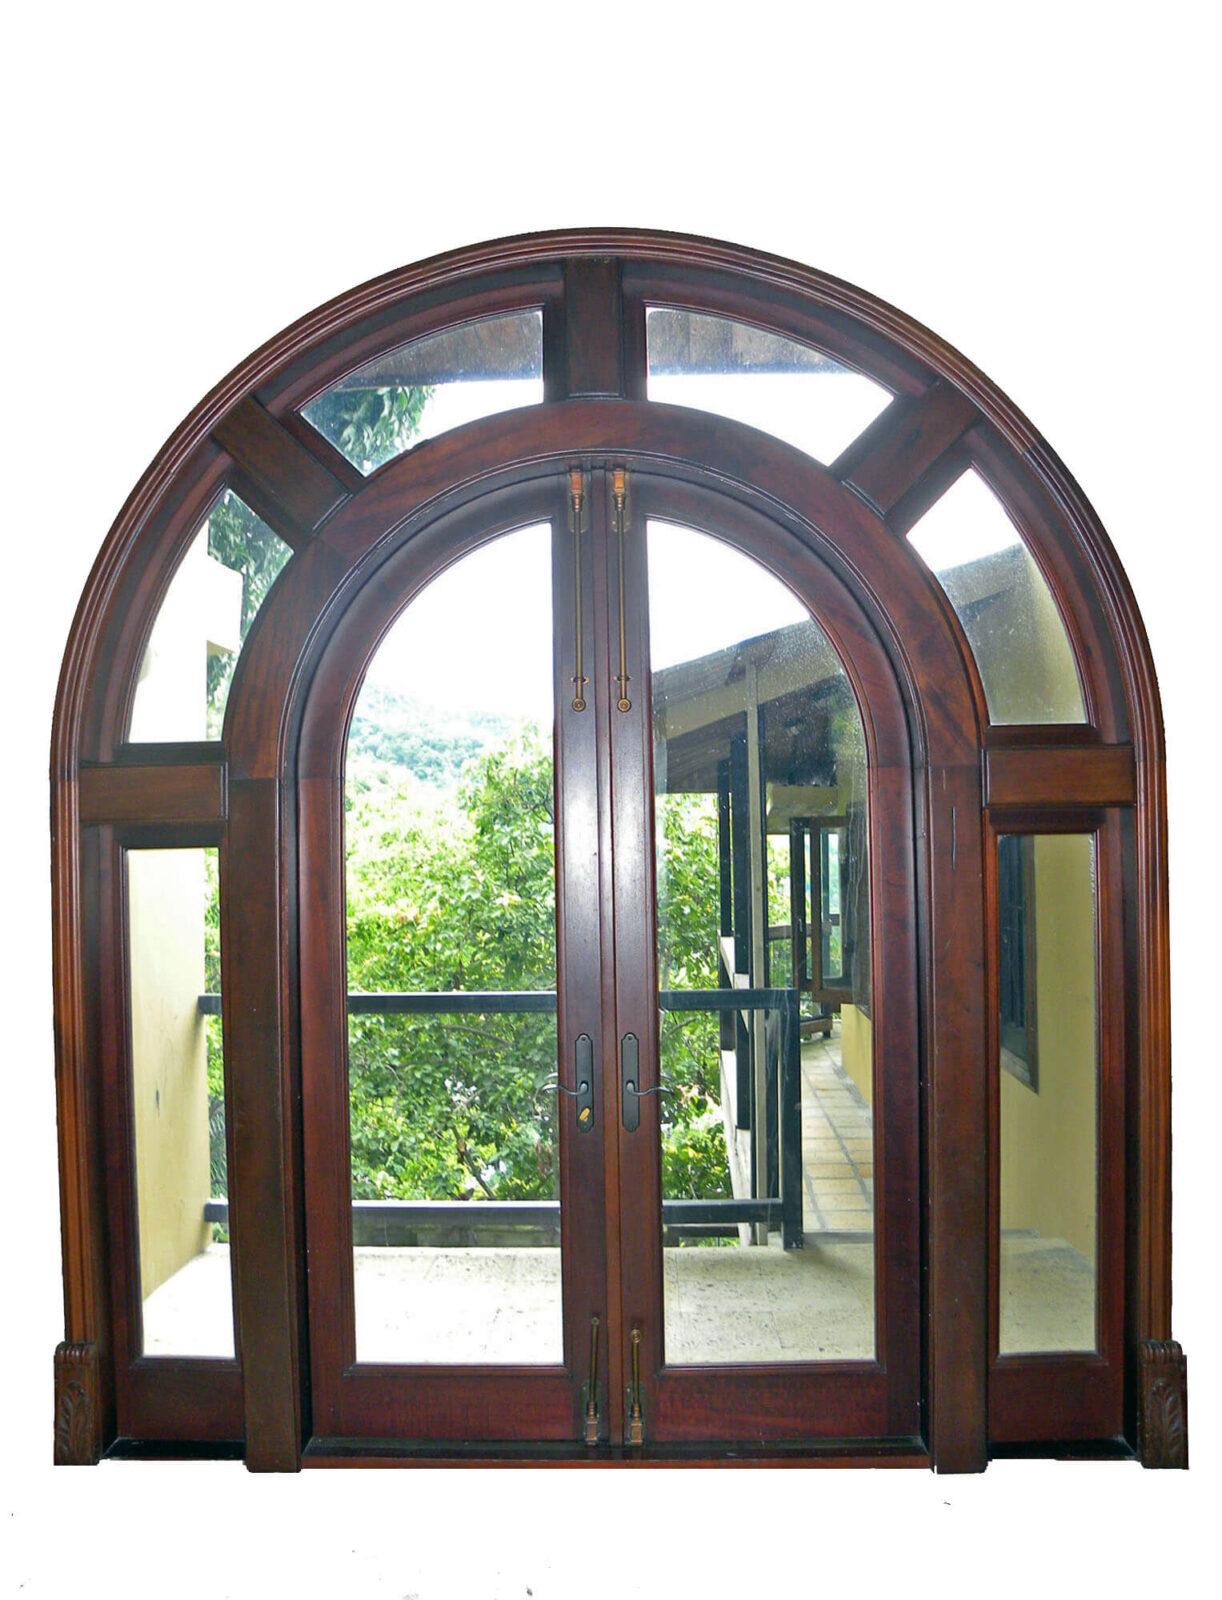 OLYMPUS MAHOGANY PATIO DOOR SYSTEM.